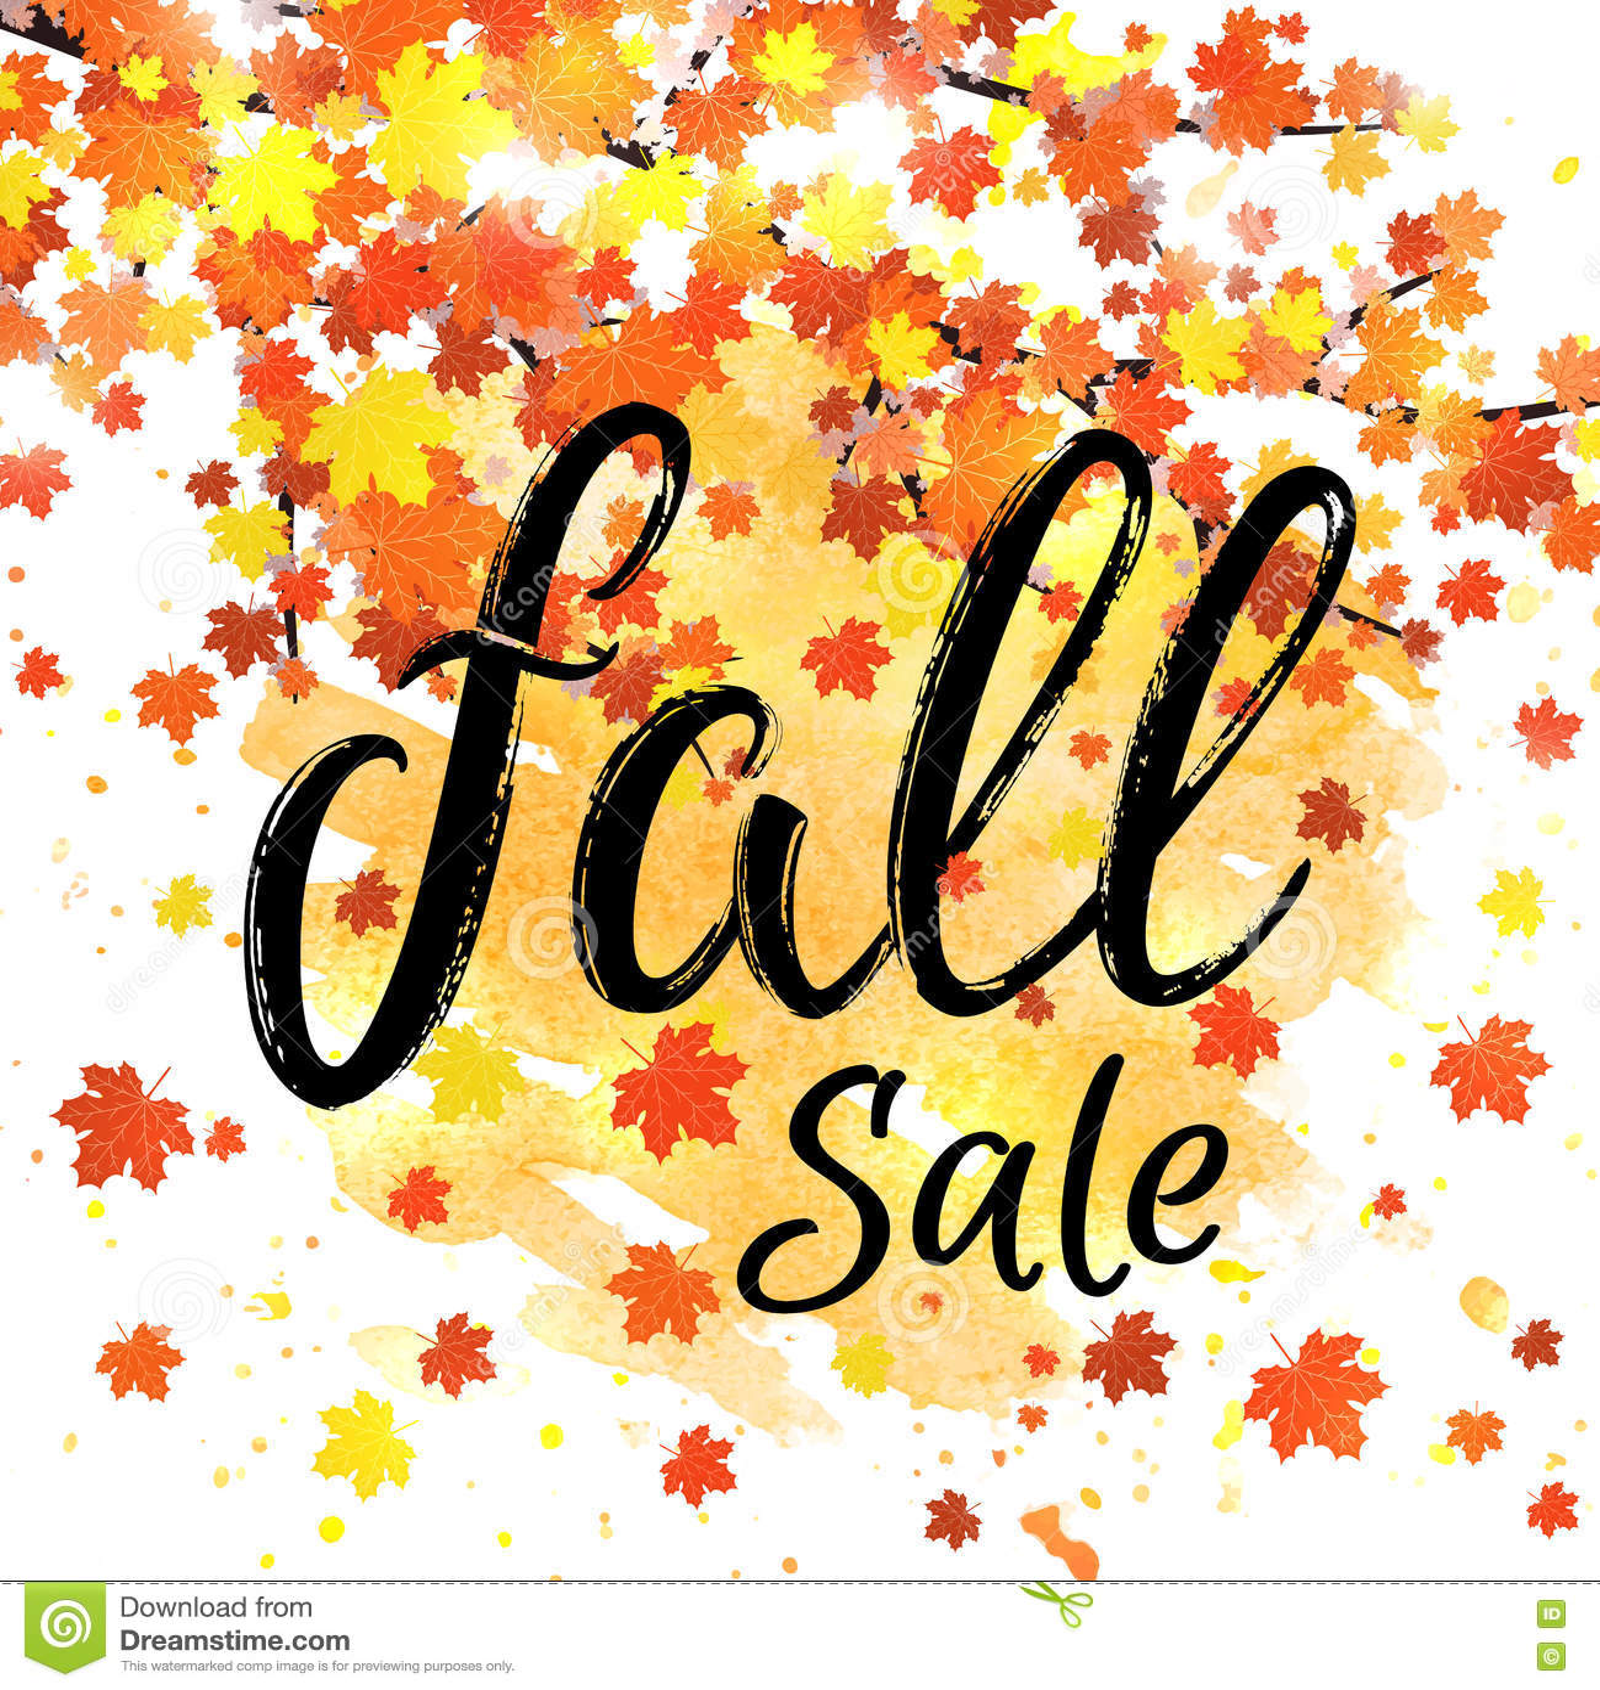 Fall Sale Lettering Banner Seasonal Discount Autumn